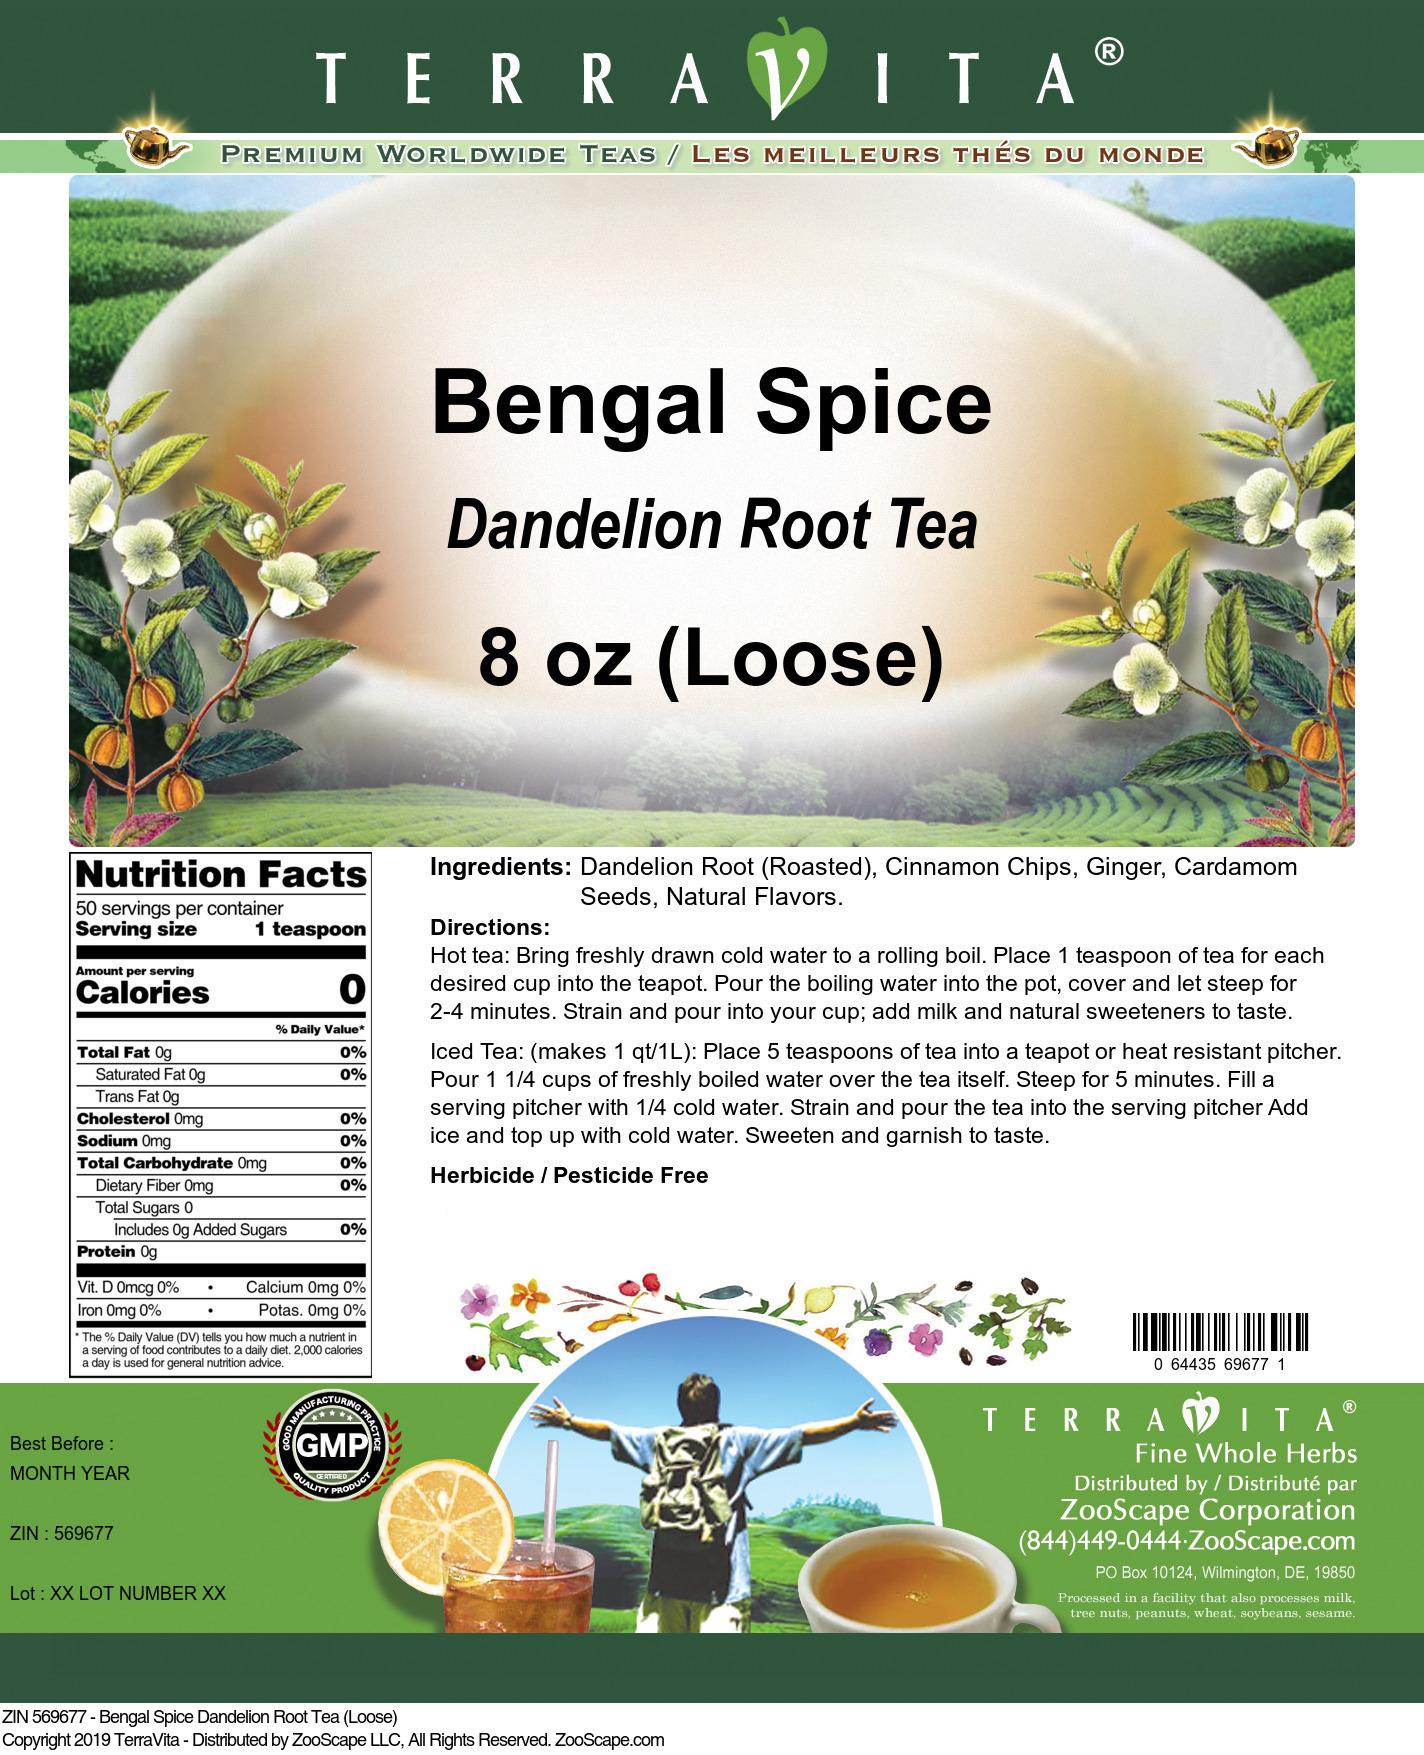 Bengal Spice Dandelion Root